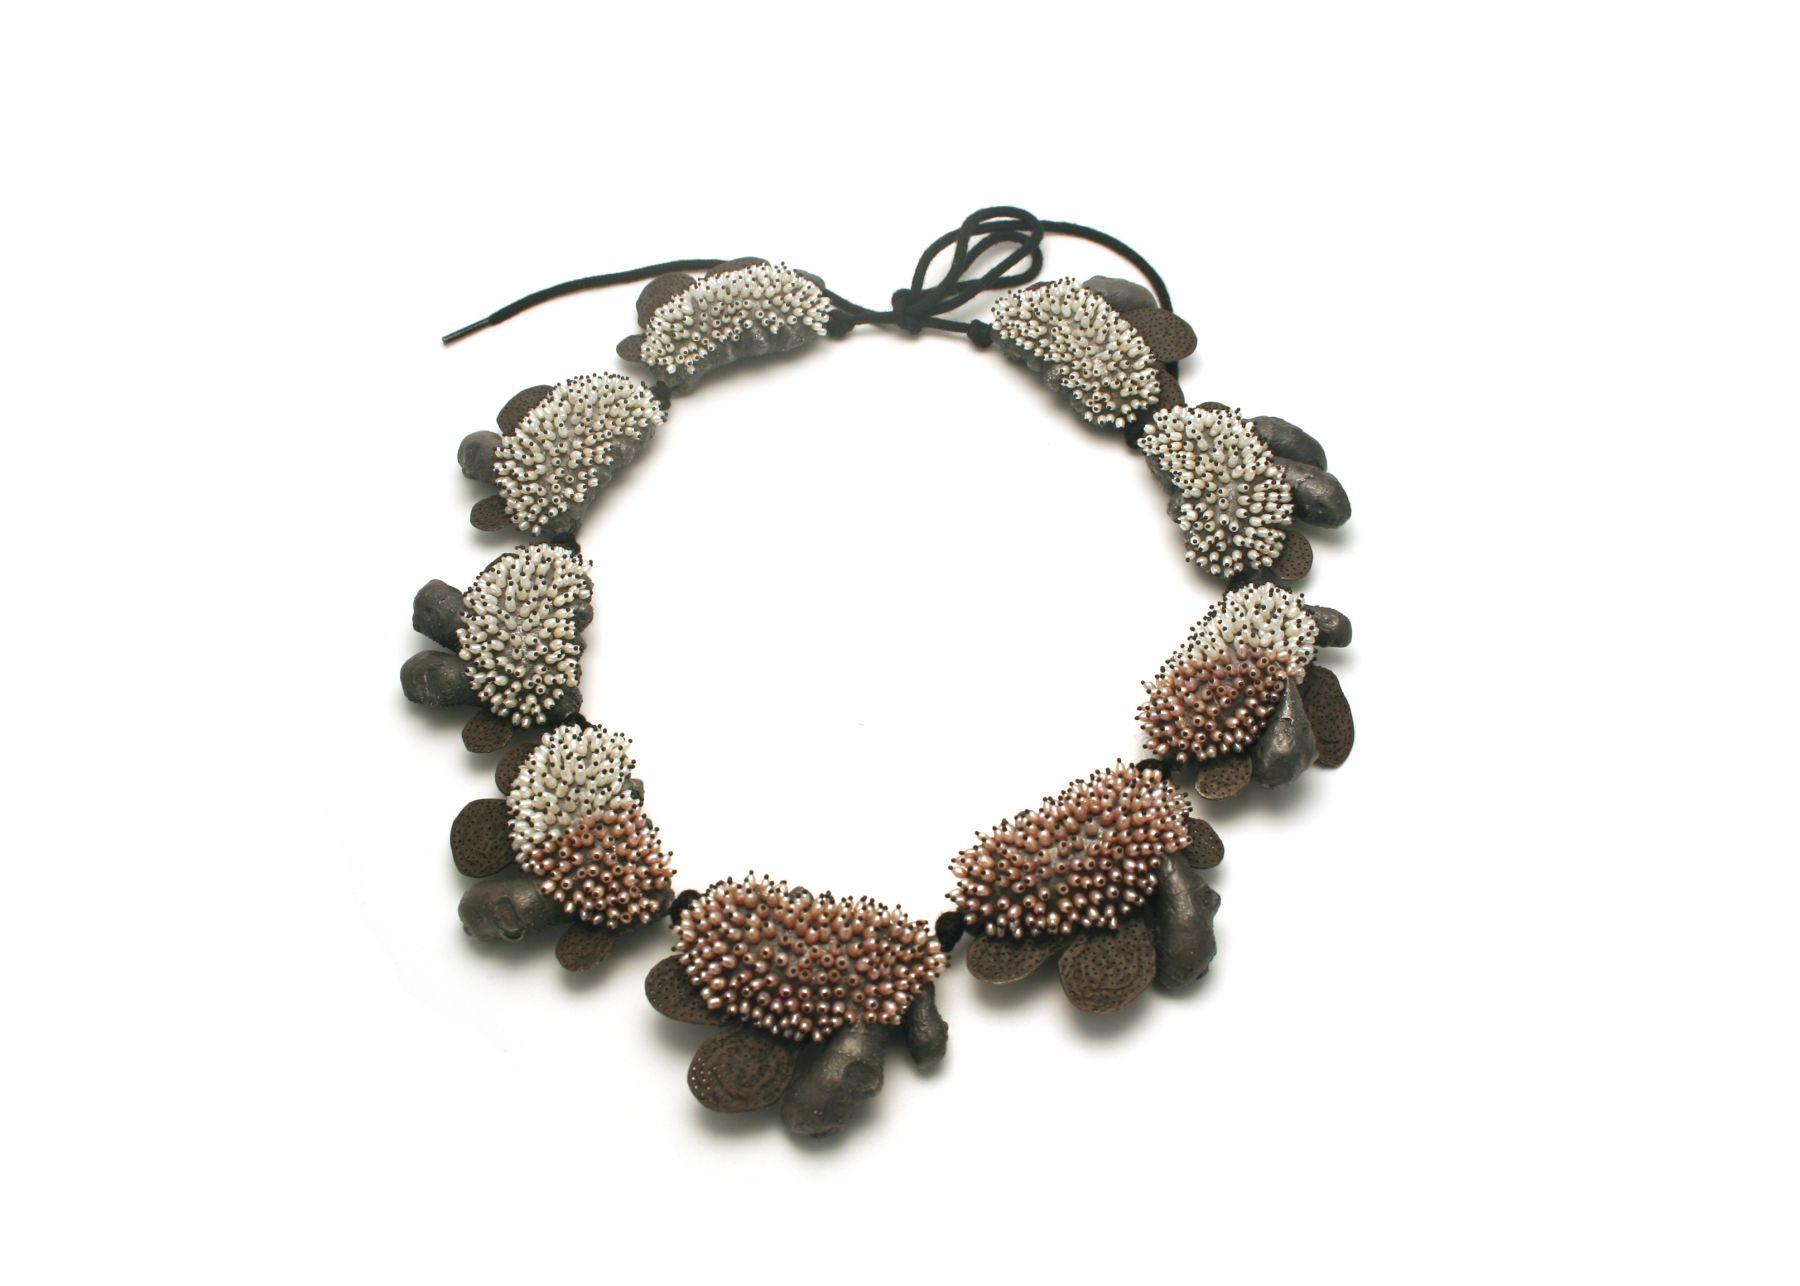 Sam Tho Duong, Ginger necklace, Ingwer